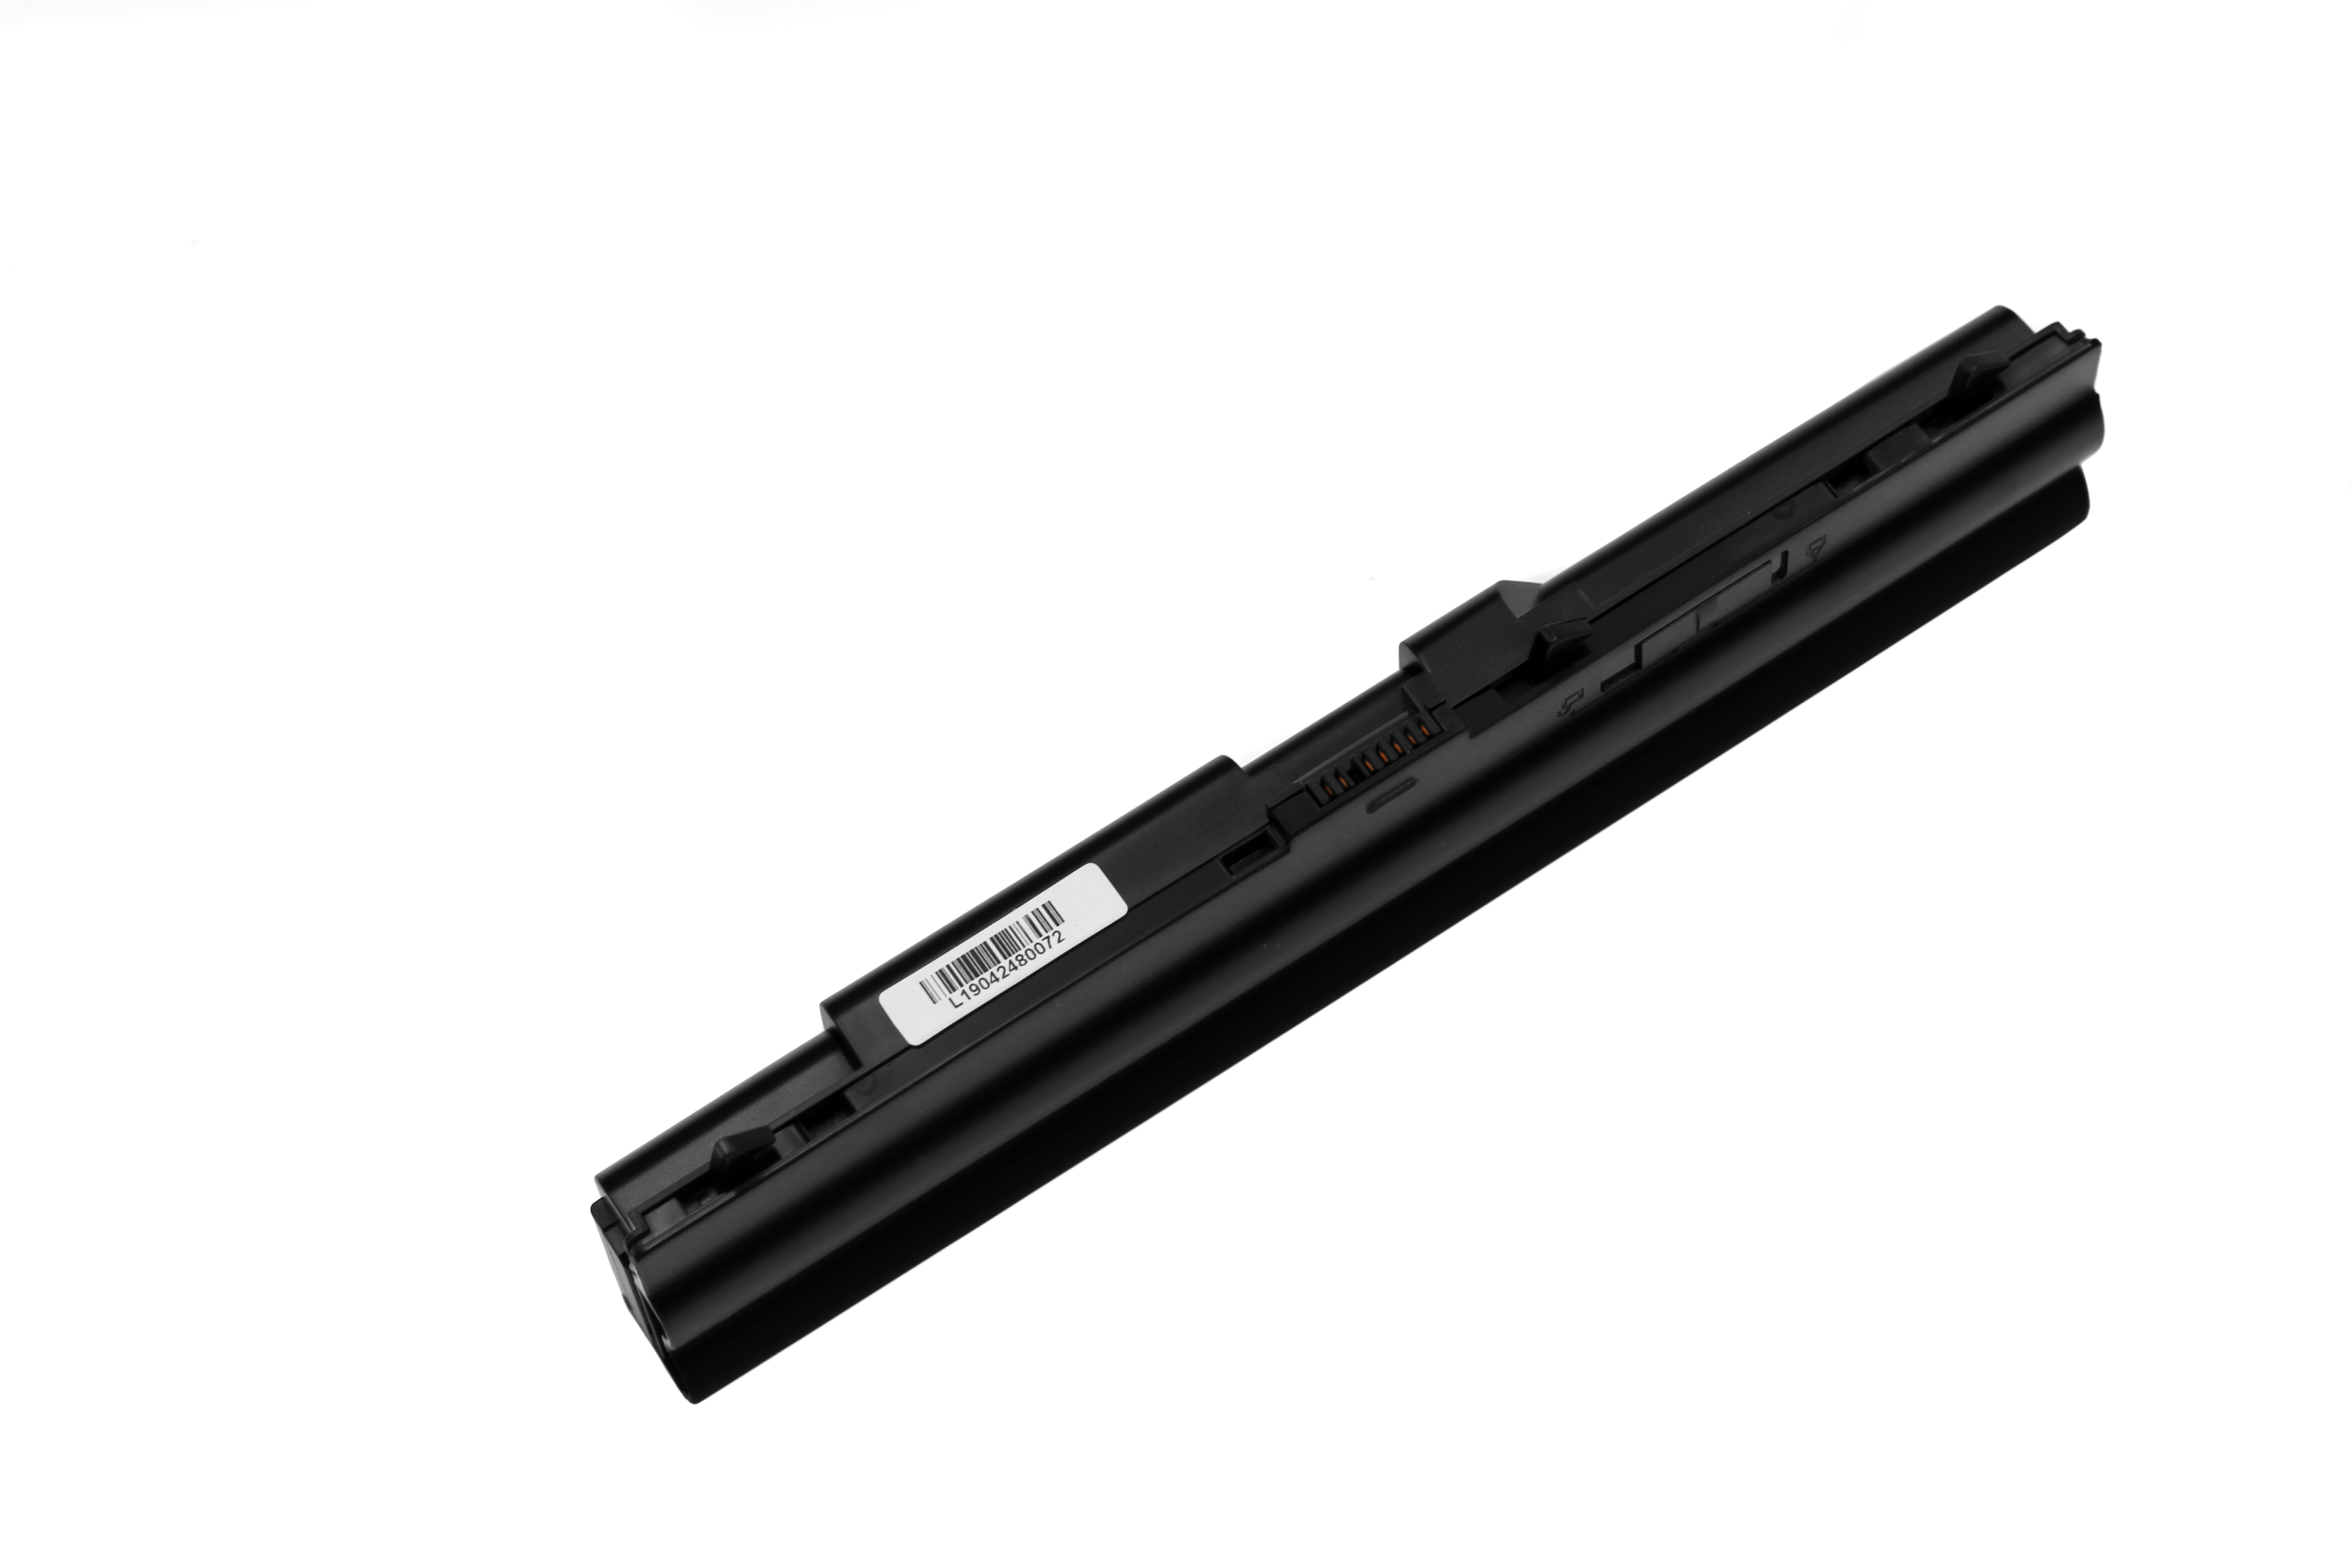 ApexWay 6 תאי מחשב נייד סוללה עבור Lenovo ThinkPad L510 L512 L520 L530 SL410 SL510 T510 T510i T410 T410i T420 T420i t430 T430i